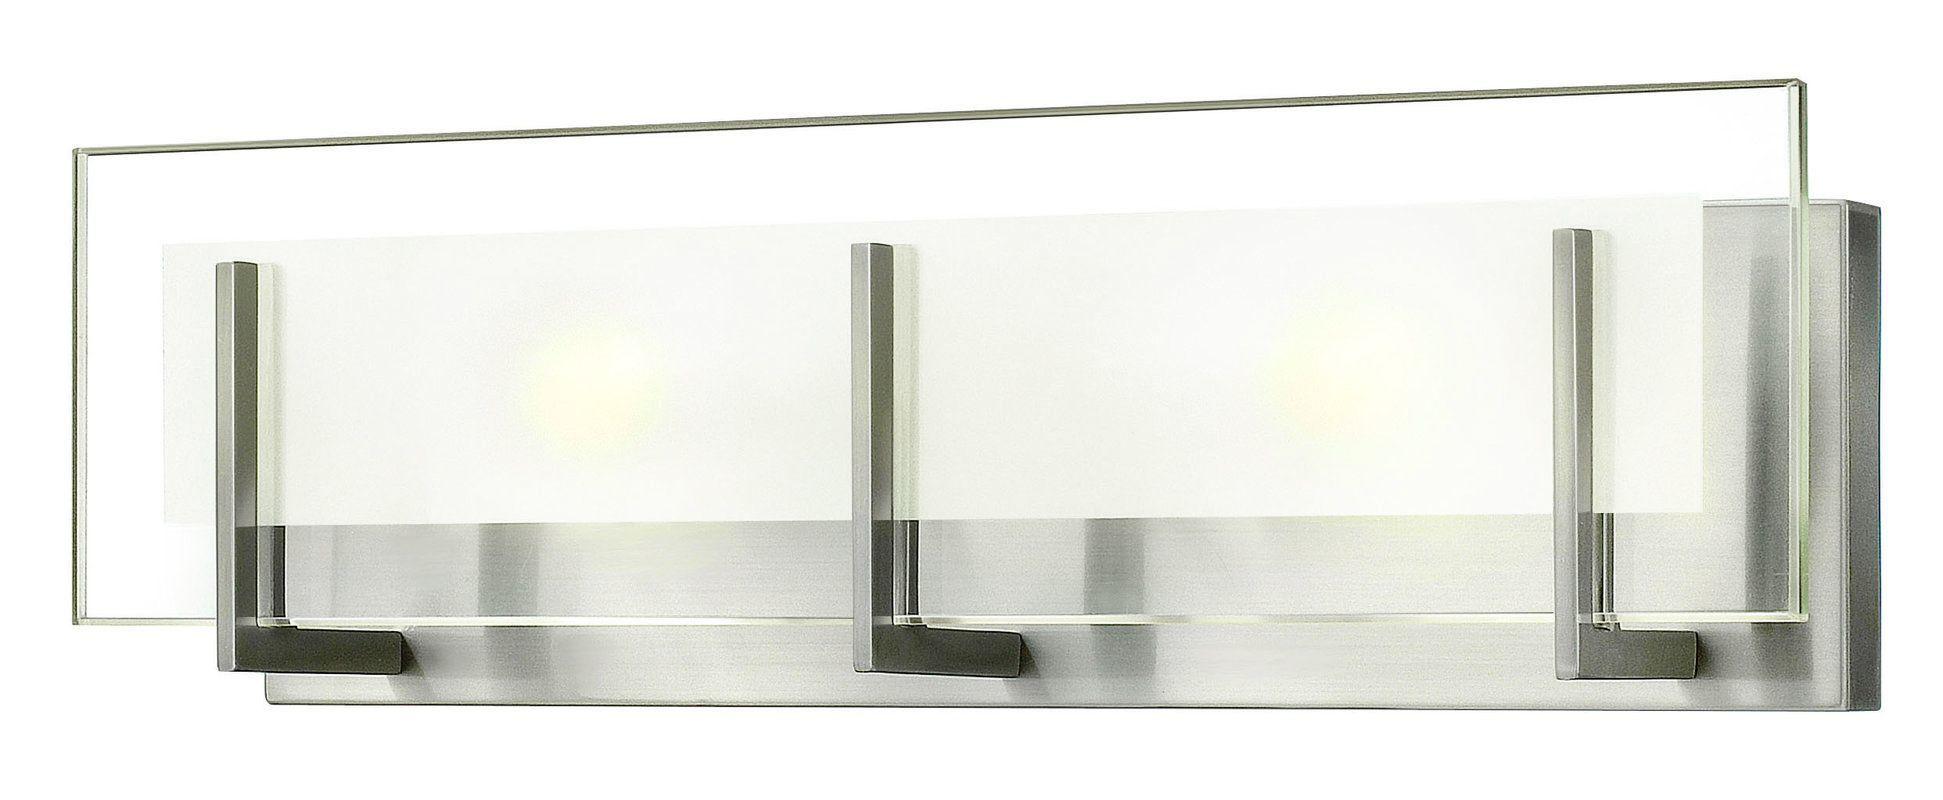 "Hinkley Lighting 5652 2 Light 18"" Width ADA Compliant Bath Bar from Sale $165.00 ITEM#: 1883984 MODEL# :5652BN UPC#: 640665565201 :"